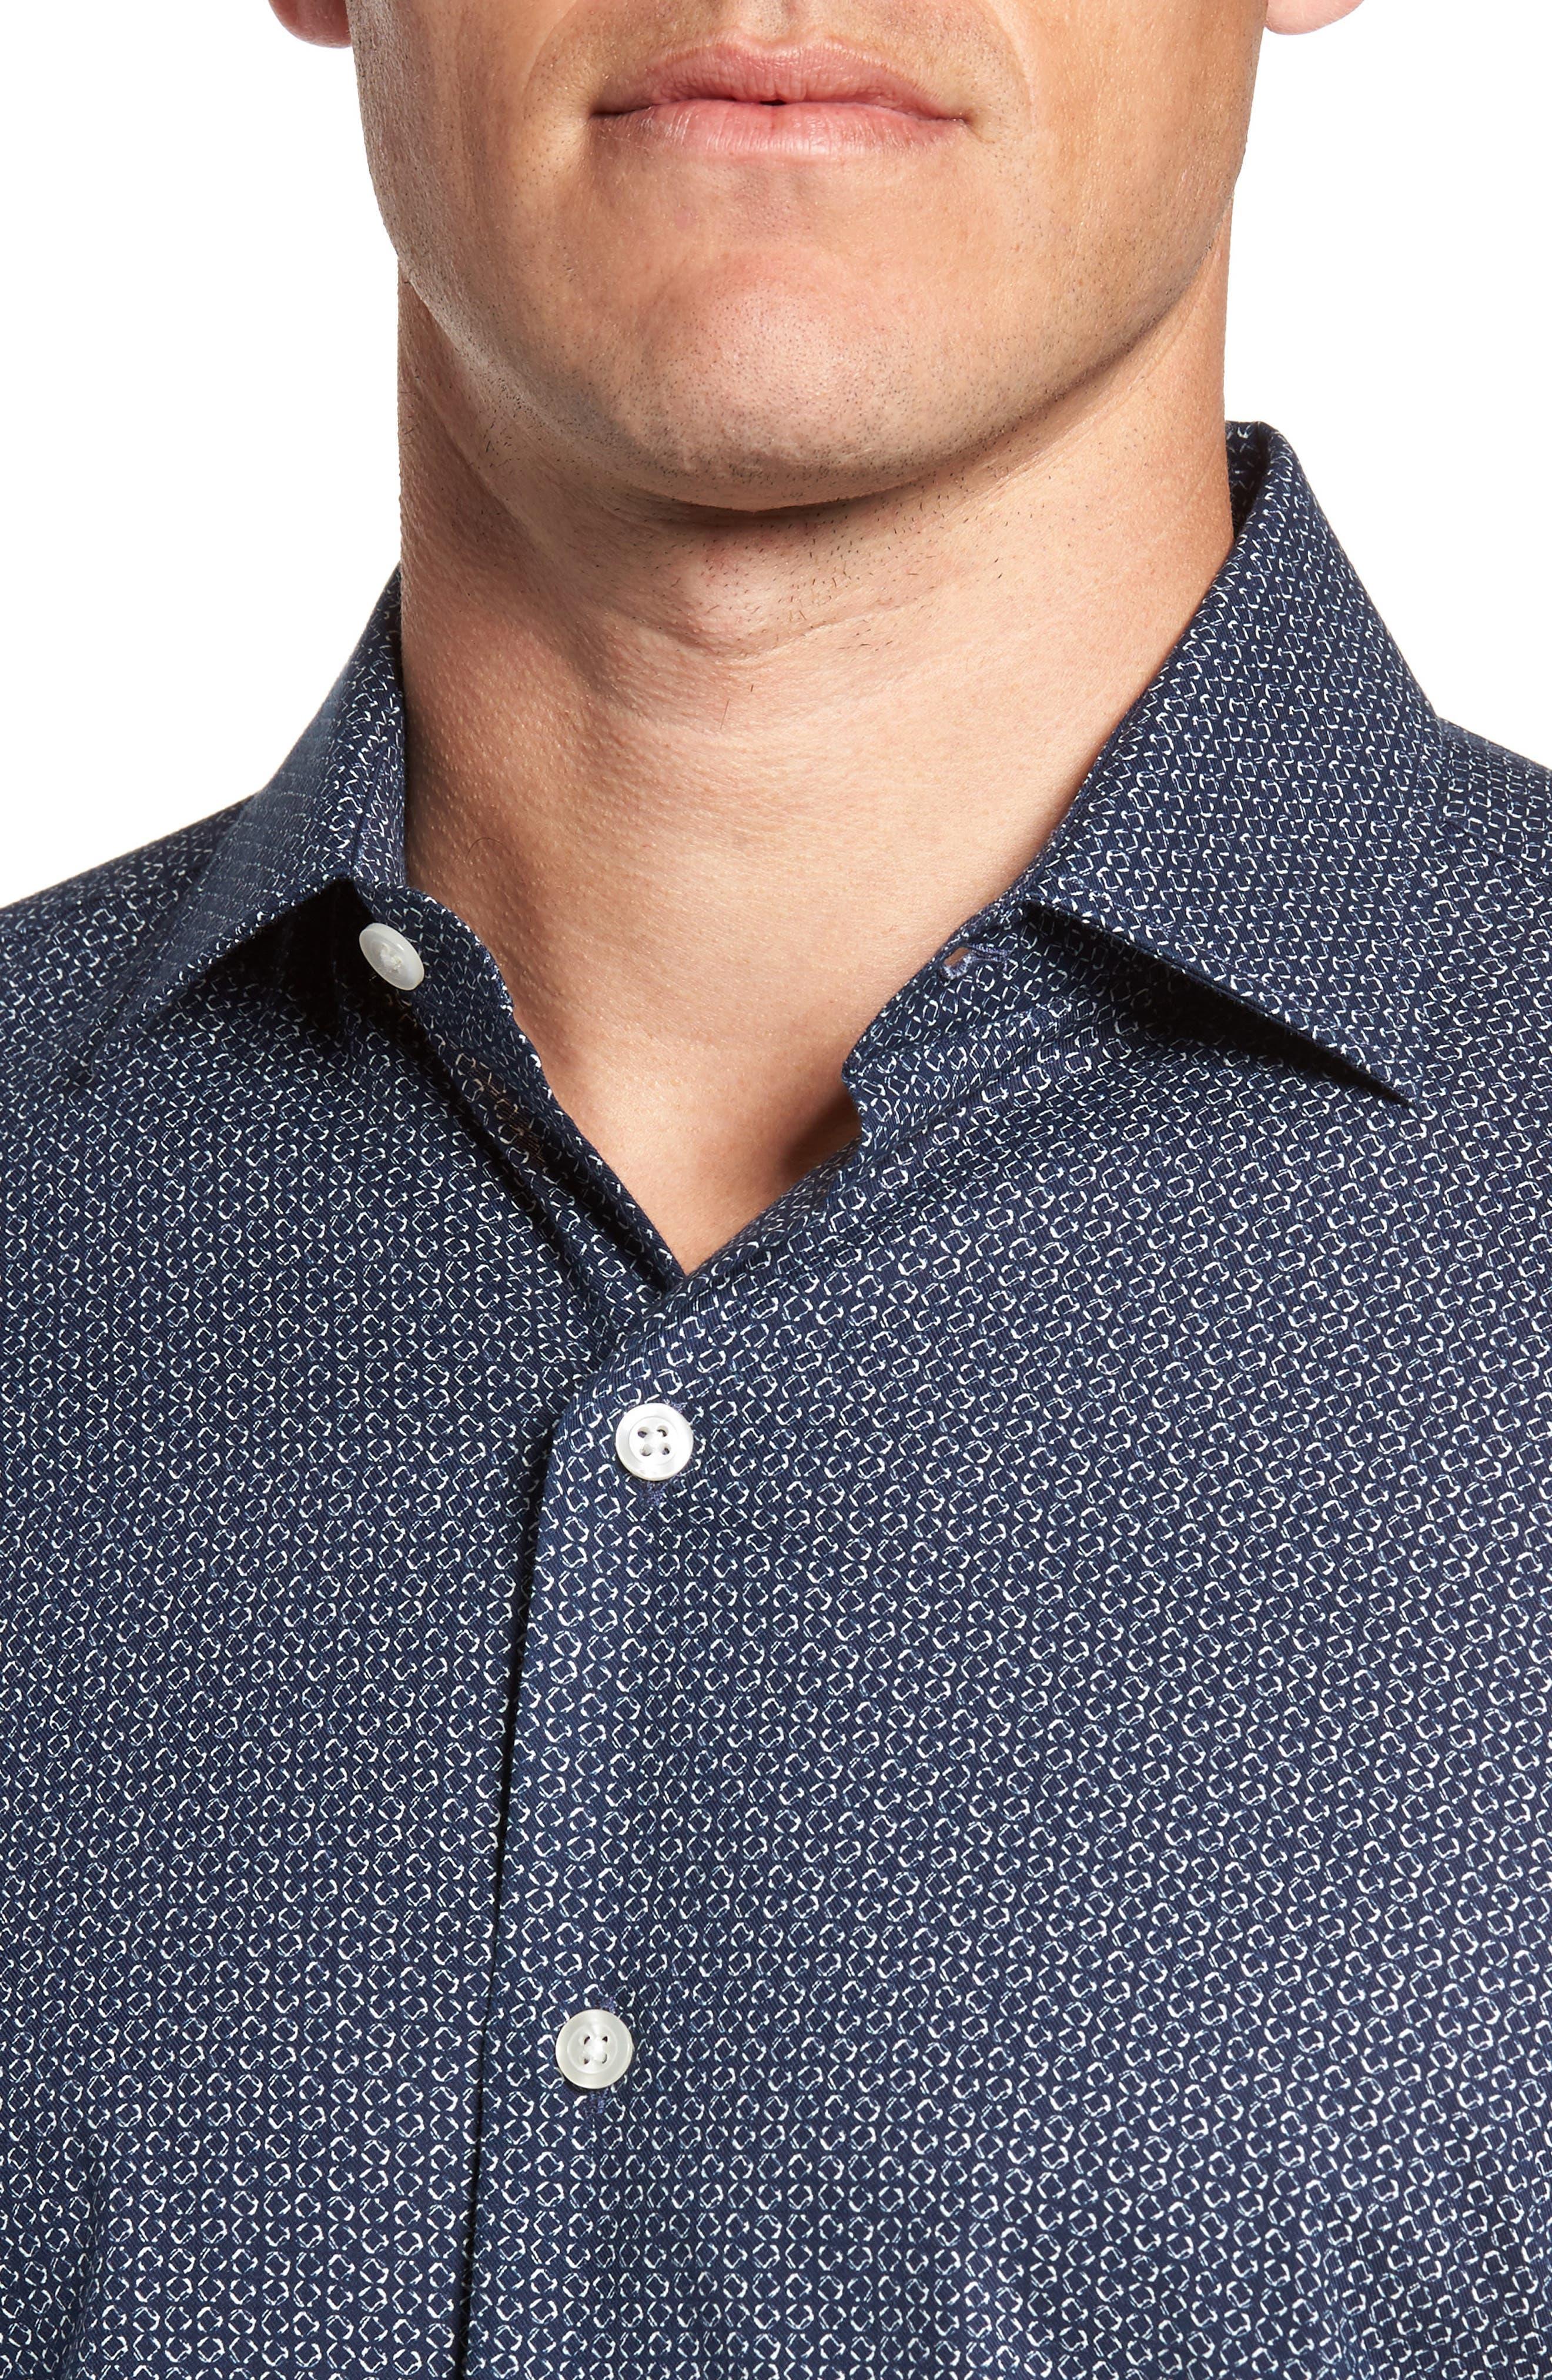 Trim Fit Abstract Print Sport Shirt,                             Alternate thumbnail 4, color,                             400